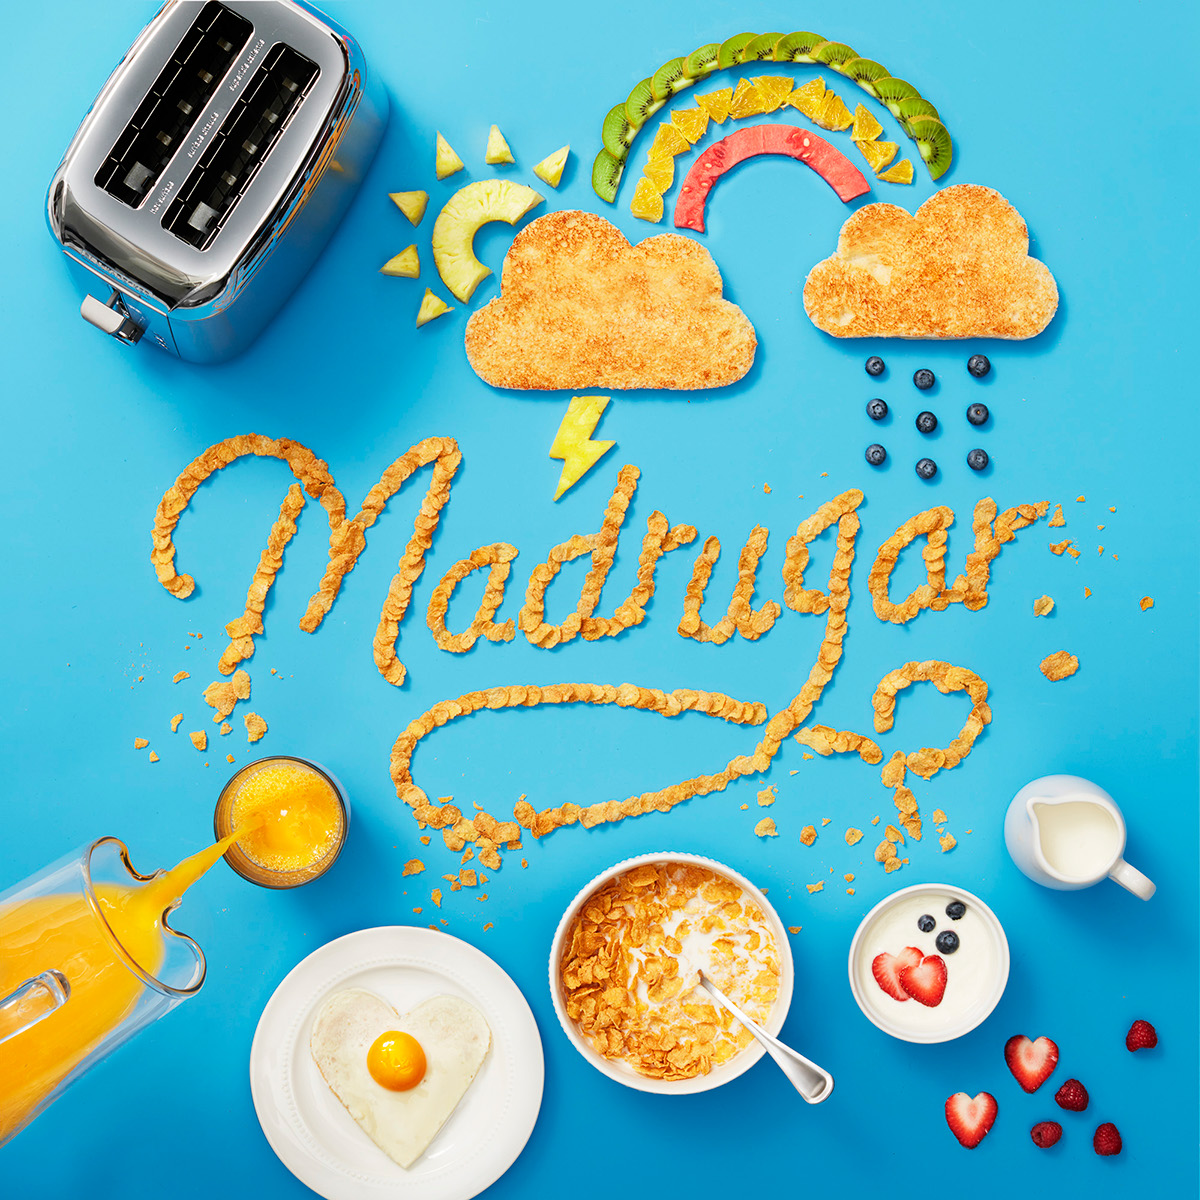 Madrugar (Breakfast), Target #SinTradución Social Media Campaign